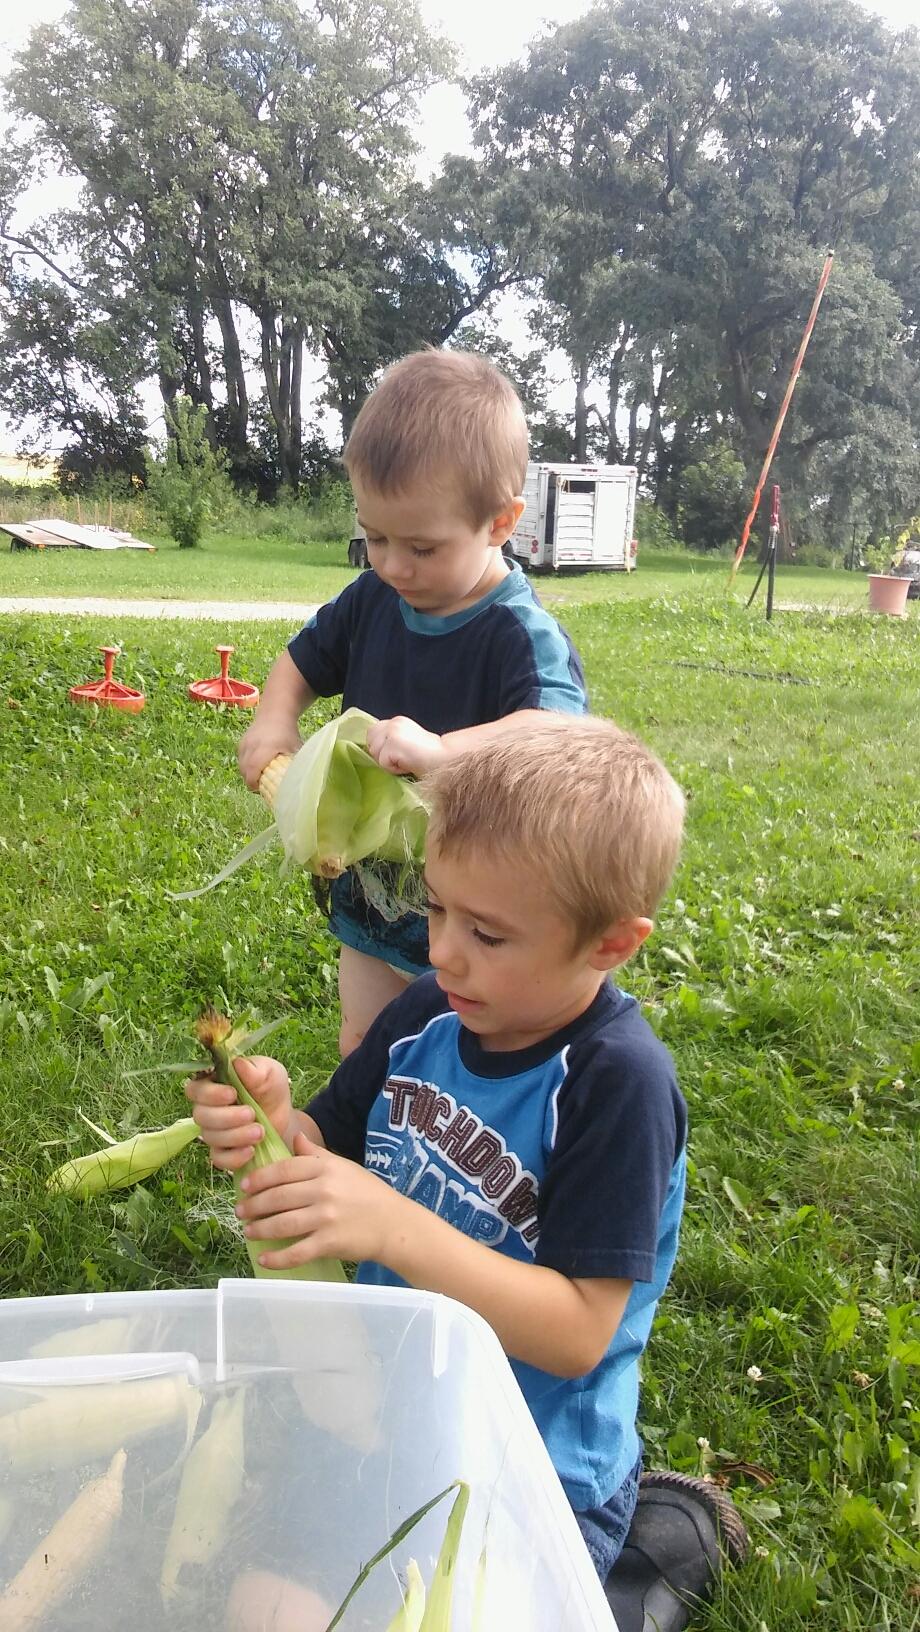 kids husking ears of corn